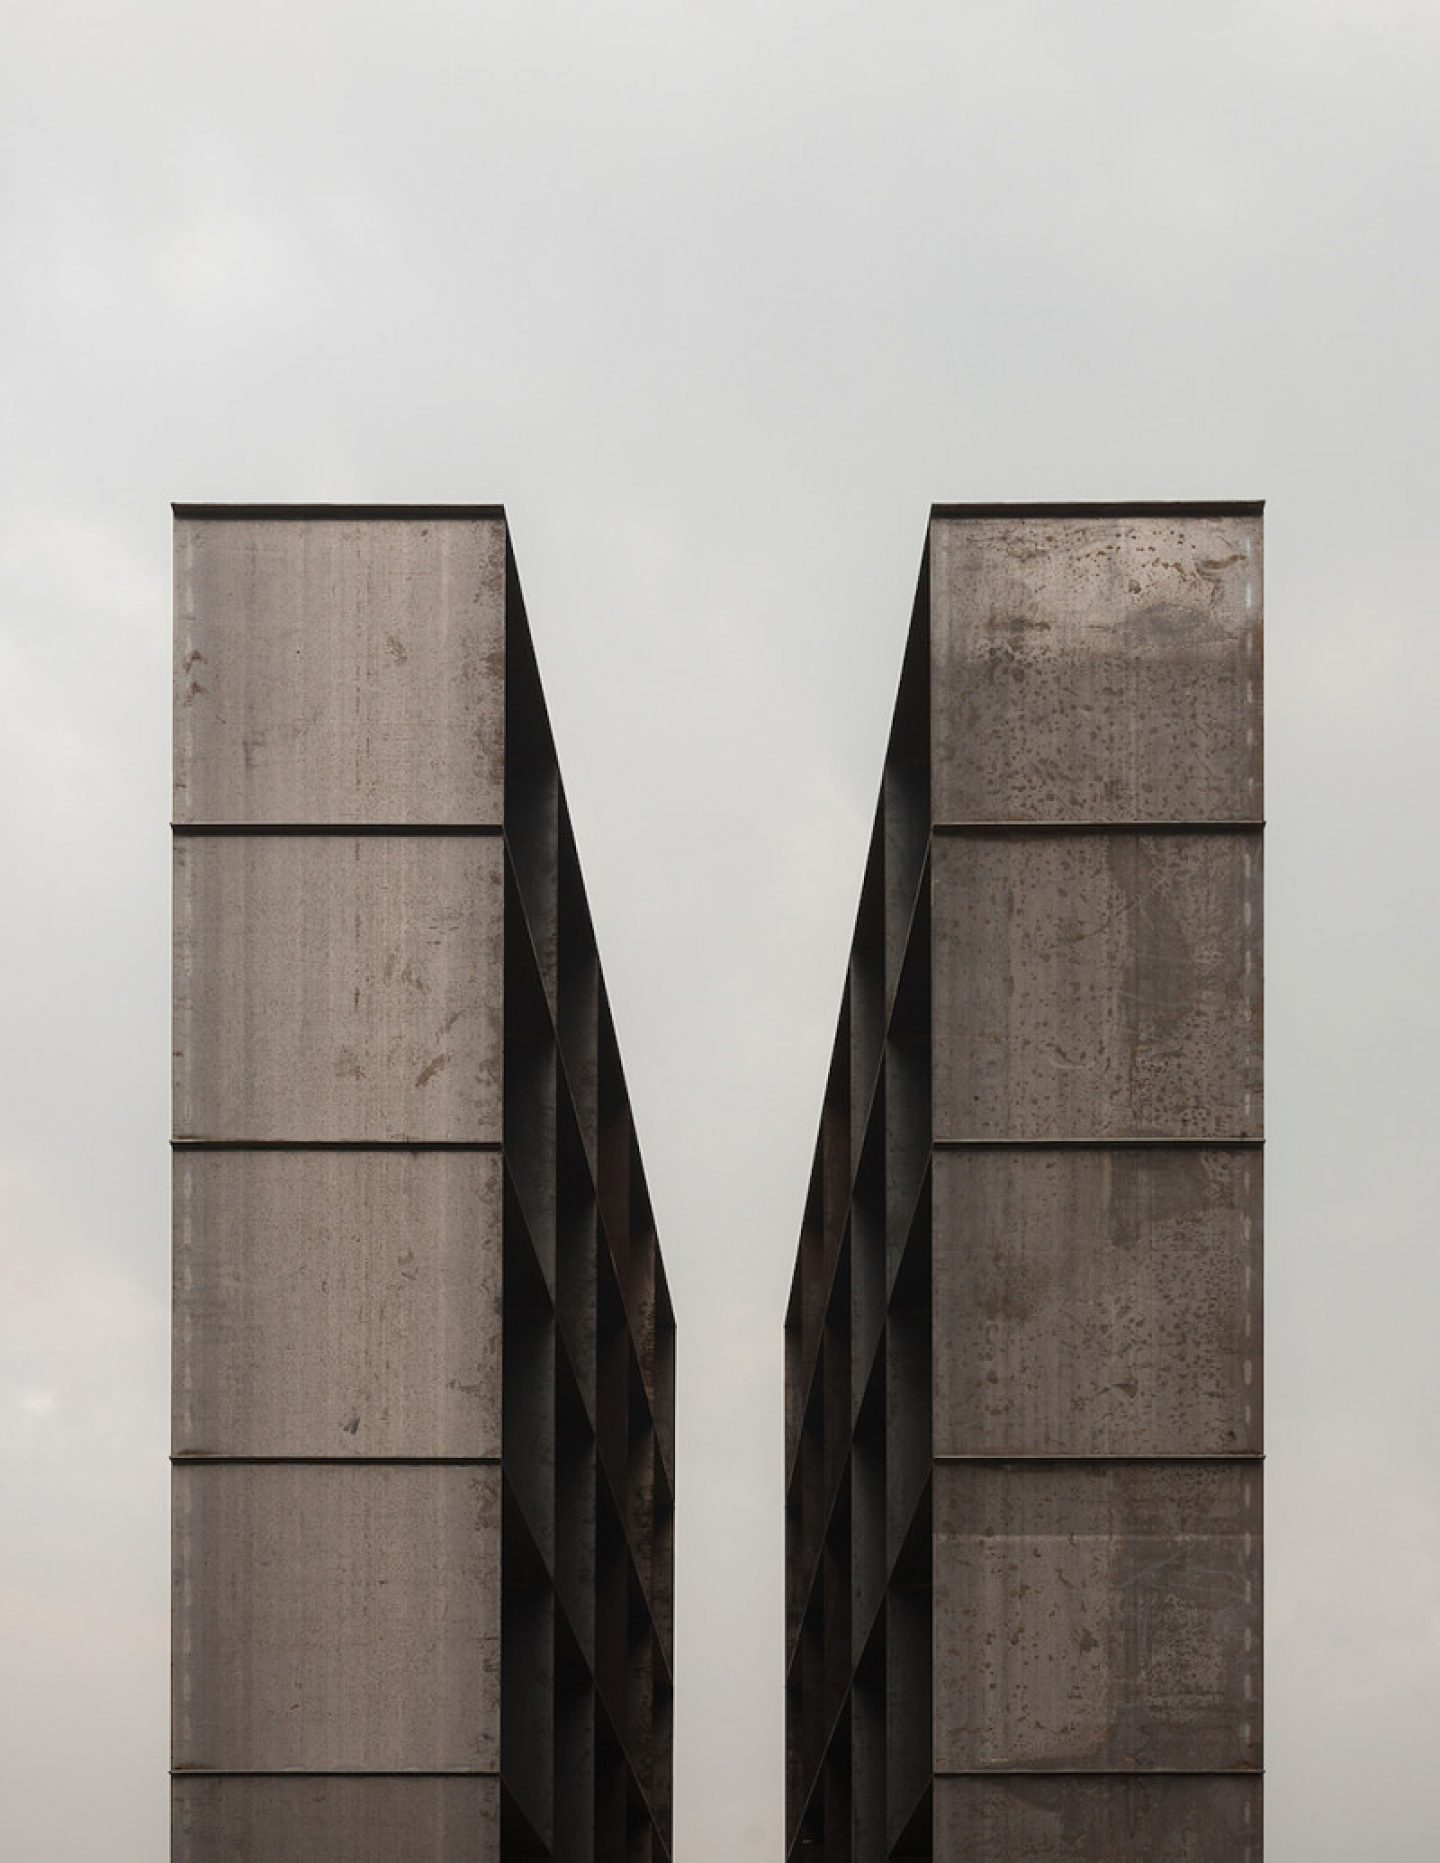 08_Bologna Shoah Memorial ©Simone Bossi